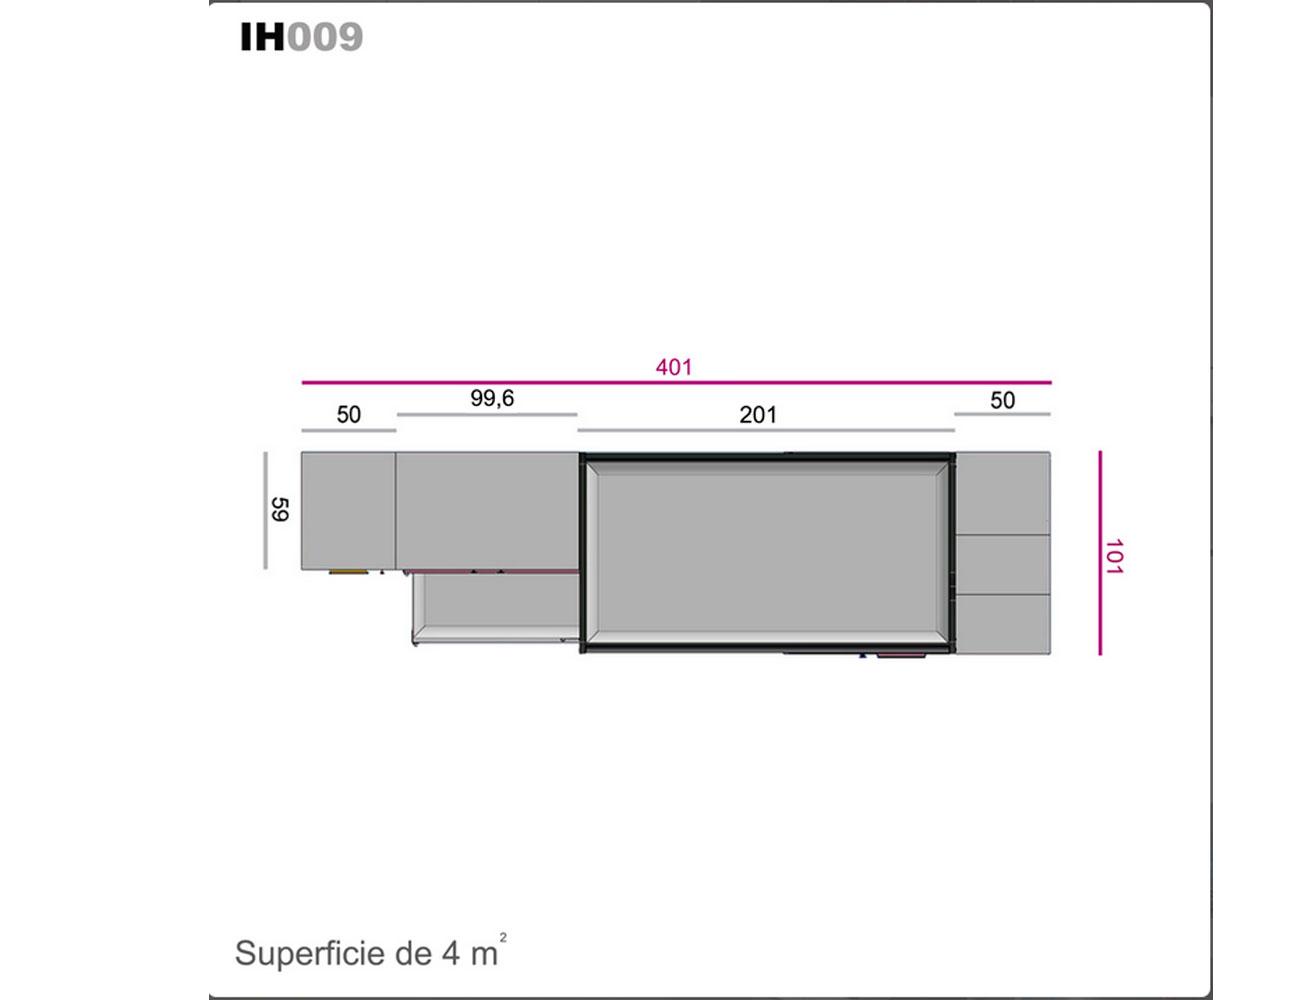 Ih09 medidas